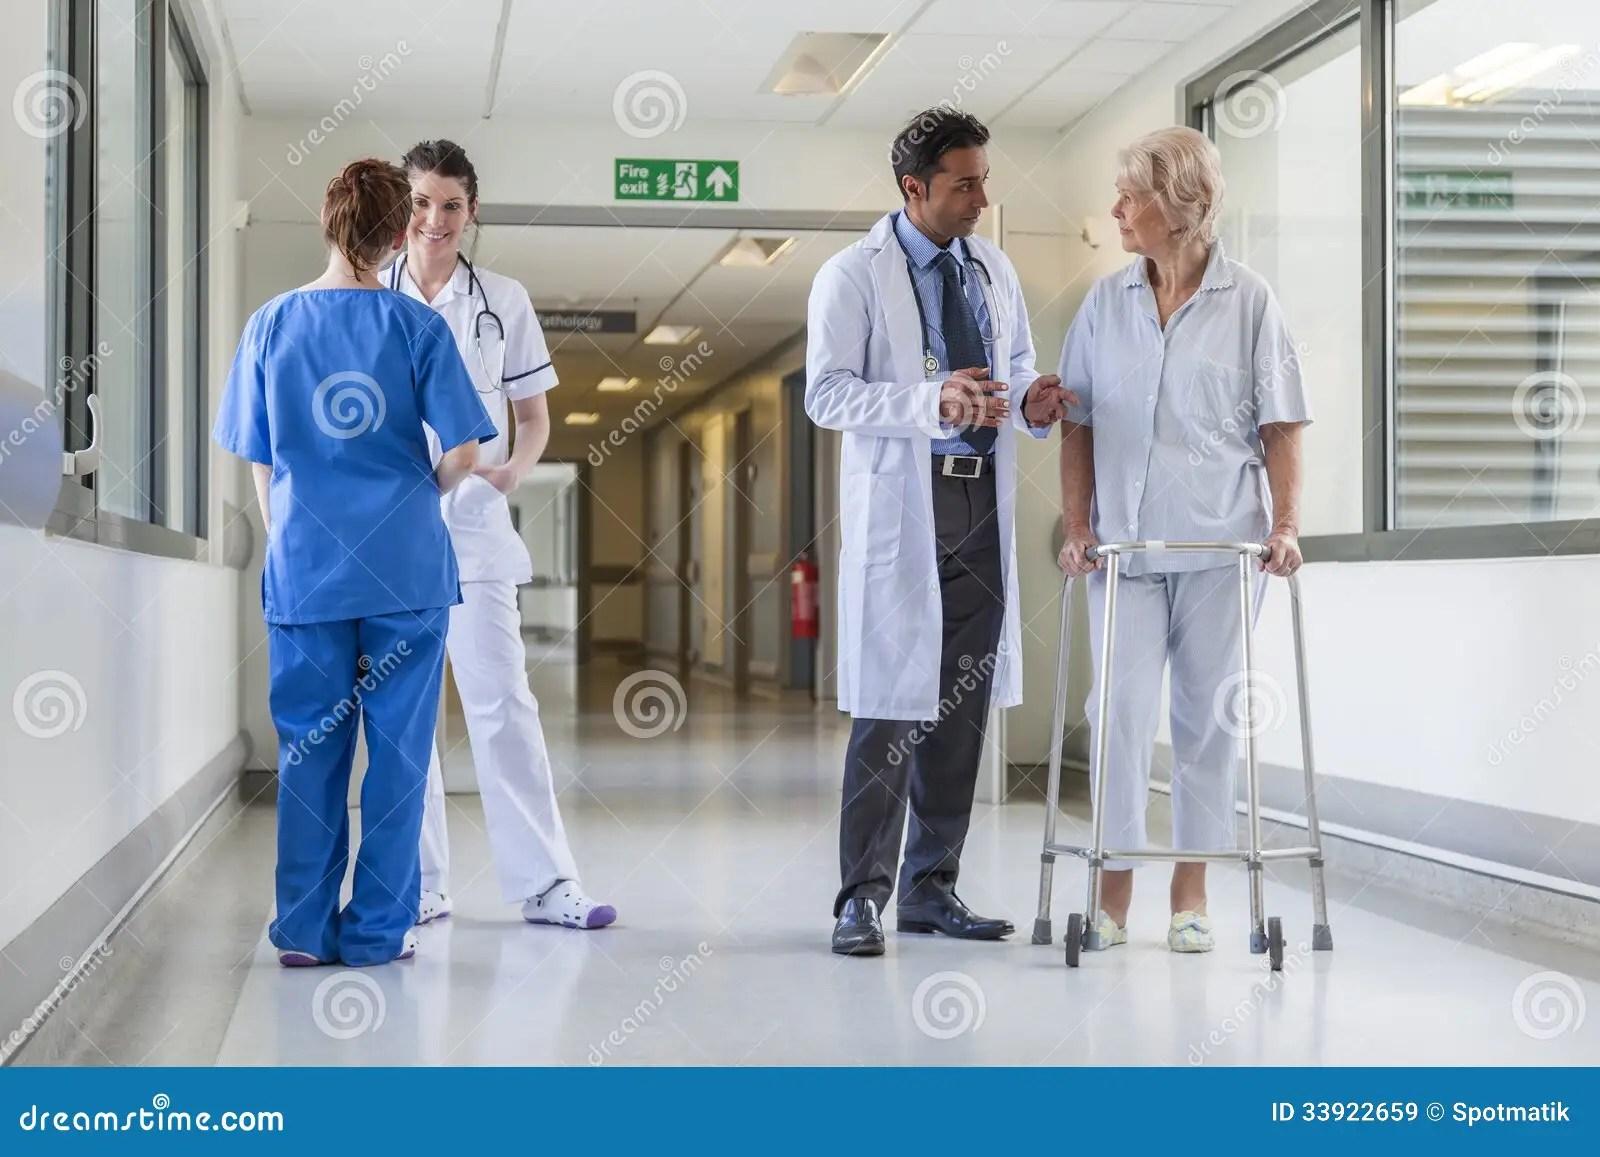 Doctors Hospital Corridor Nurse Senior Female Patient